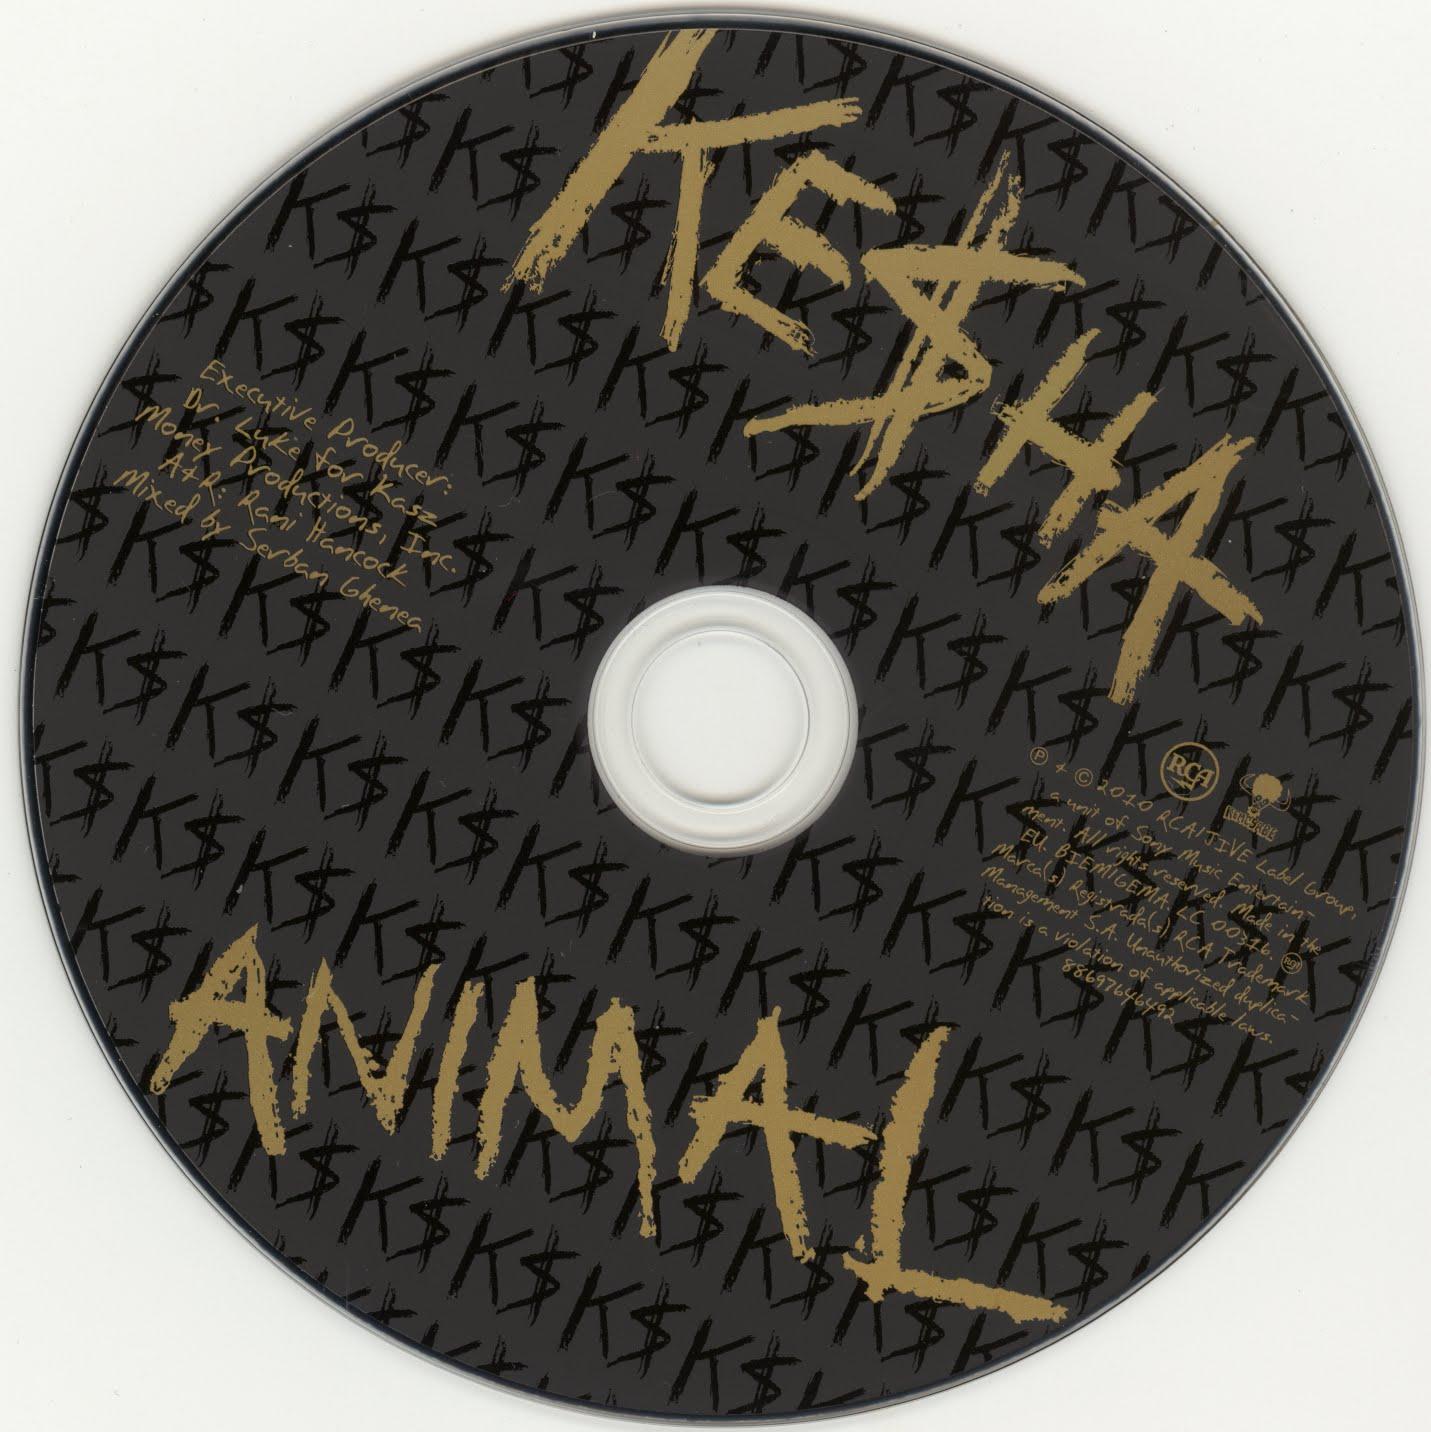 http://1.bp.blogspot.com/_iK8pXbu-0r0/TLbWSn5anJI/AAAAAAAAAg0/roz6D4DcISo/s1600/Kesha_-_Animal_%5BCD%5D.jpg